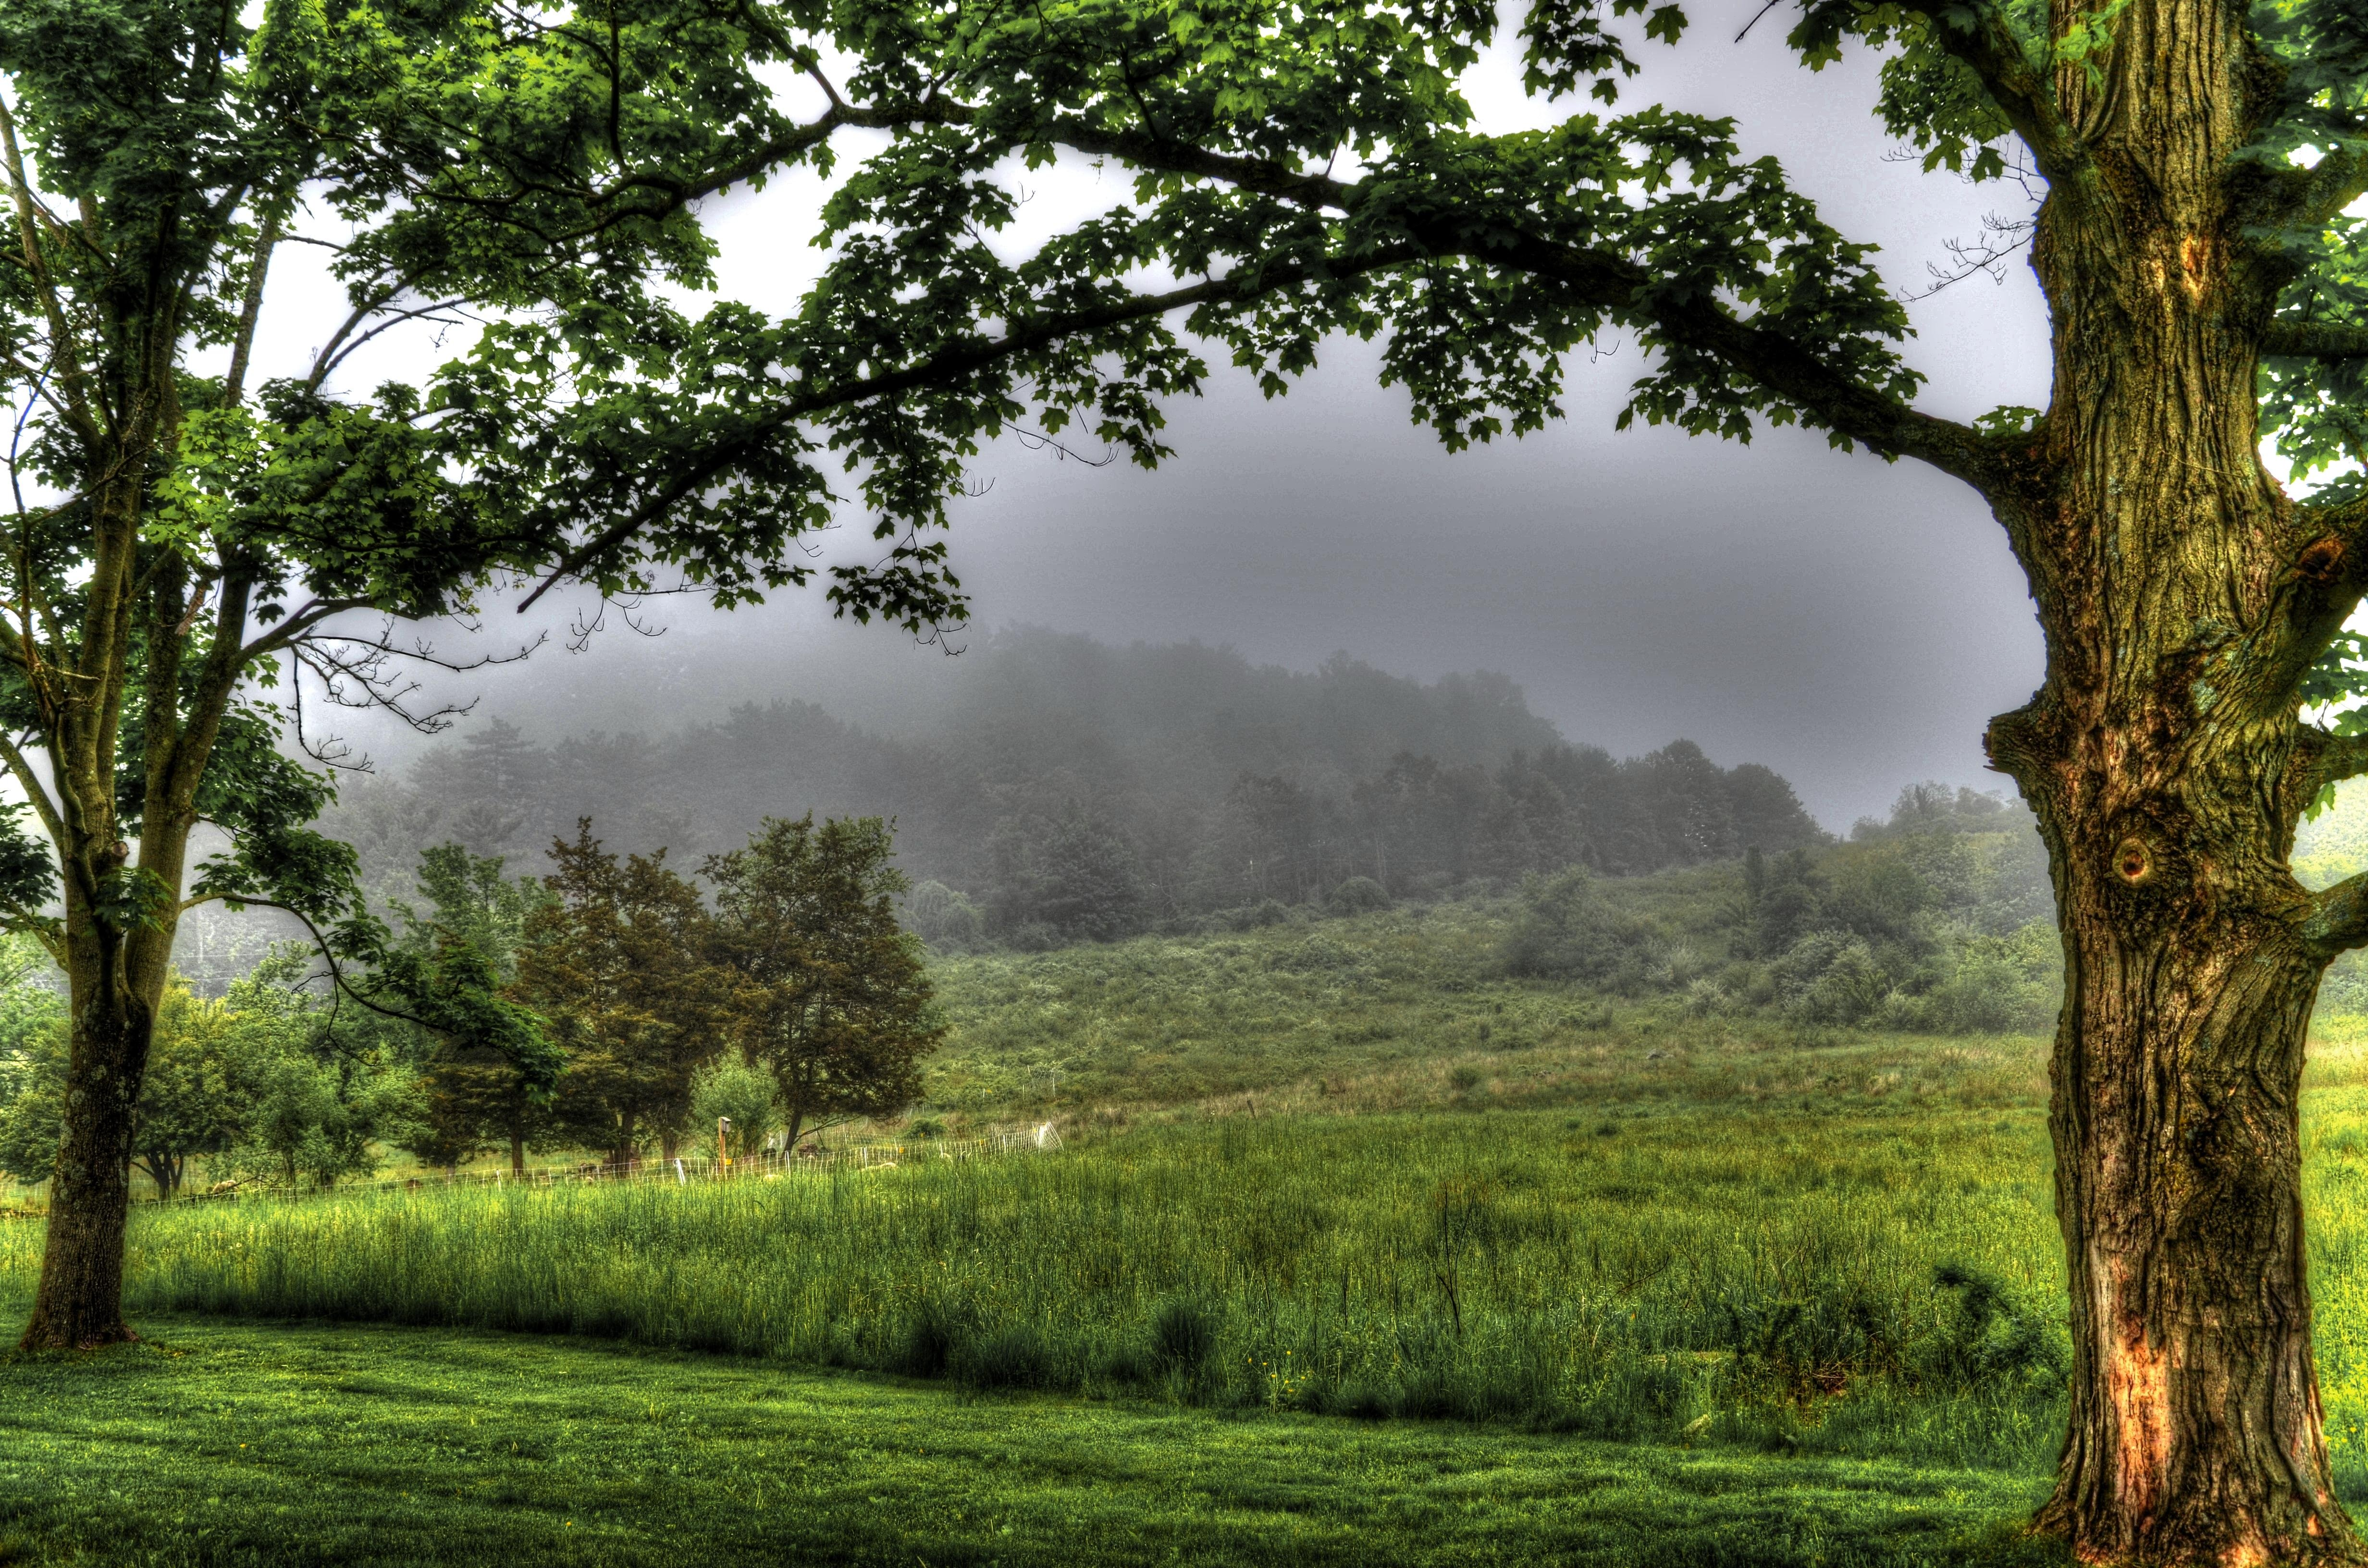 landscapes trees fog - photo #15